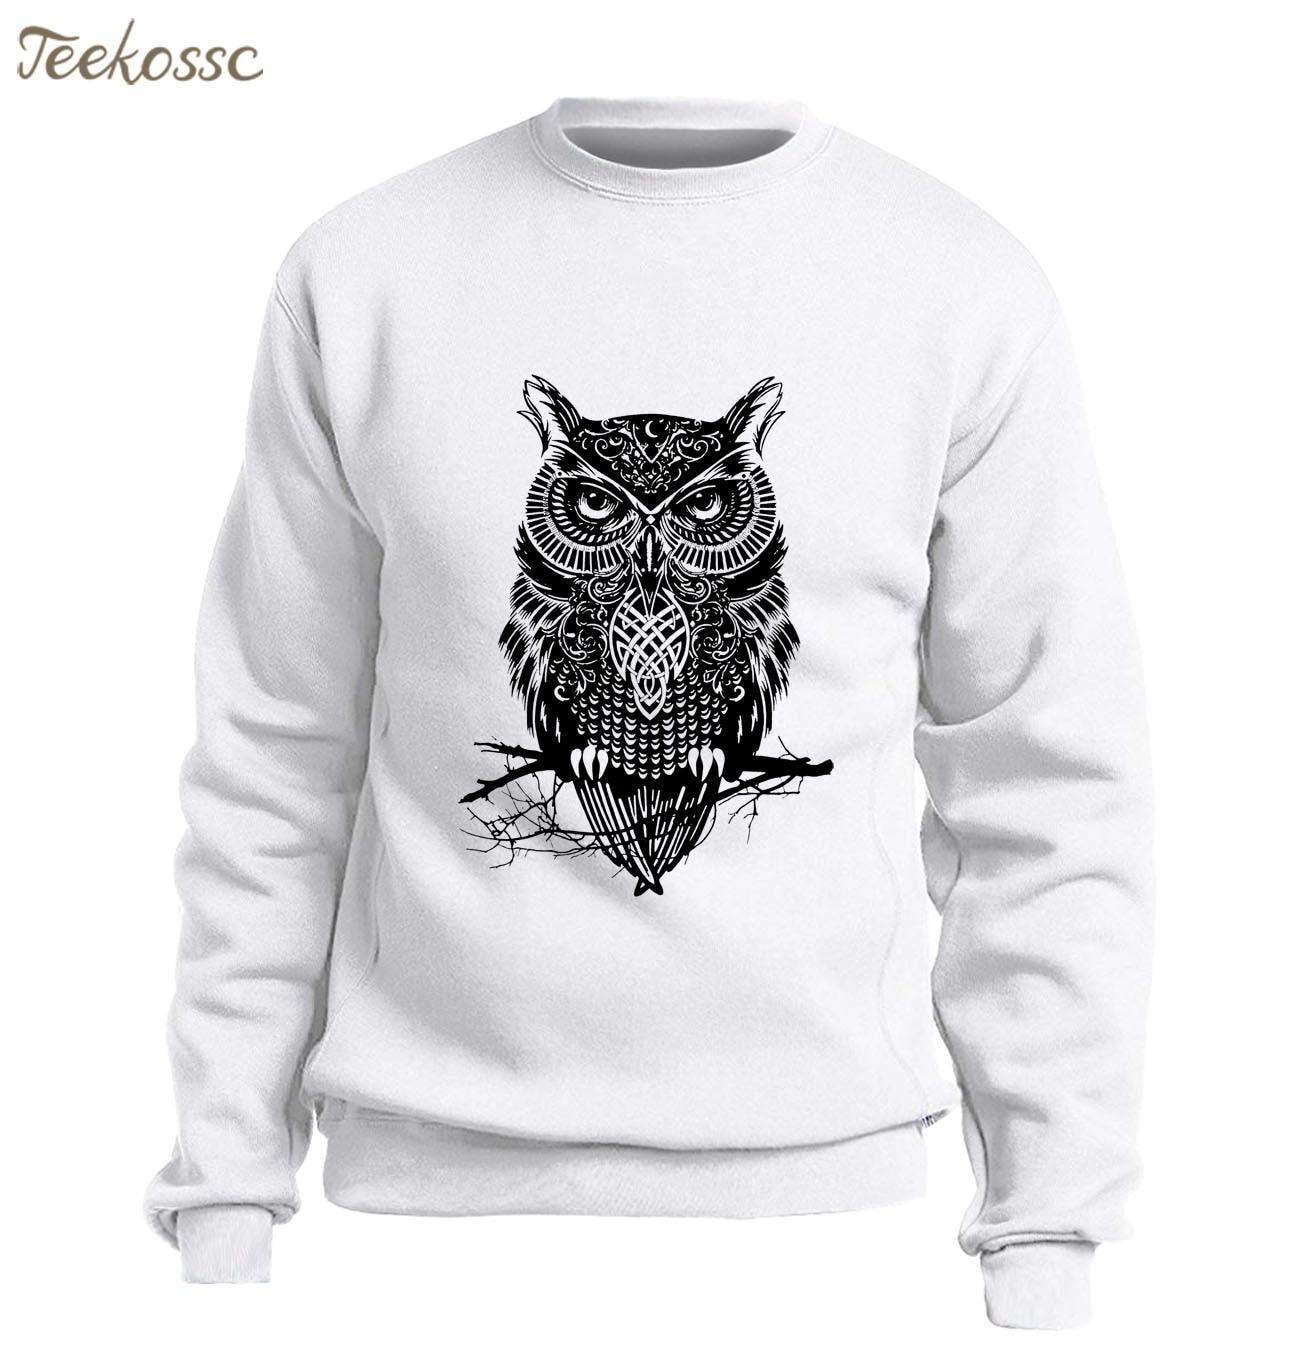 Animal Owl Sweatshirt Men Graphics Design Hoodie Slim Fit Pullover Sweatshirts Winter Autumn Fleece Warm Streetwear White Hoody